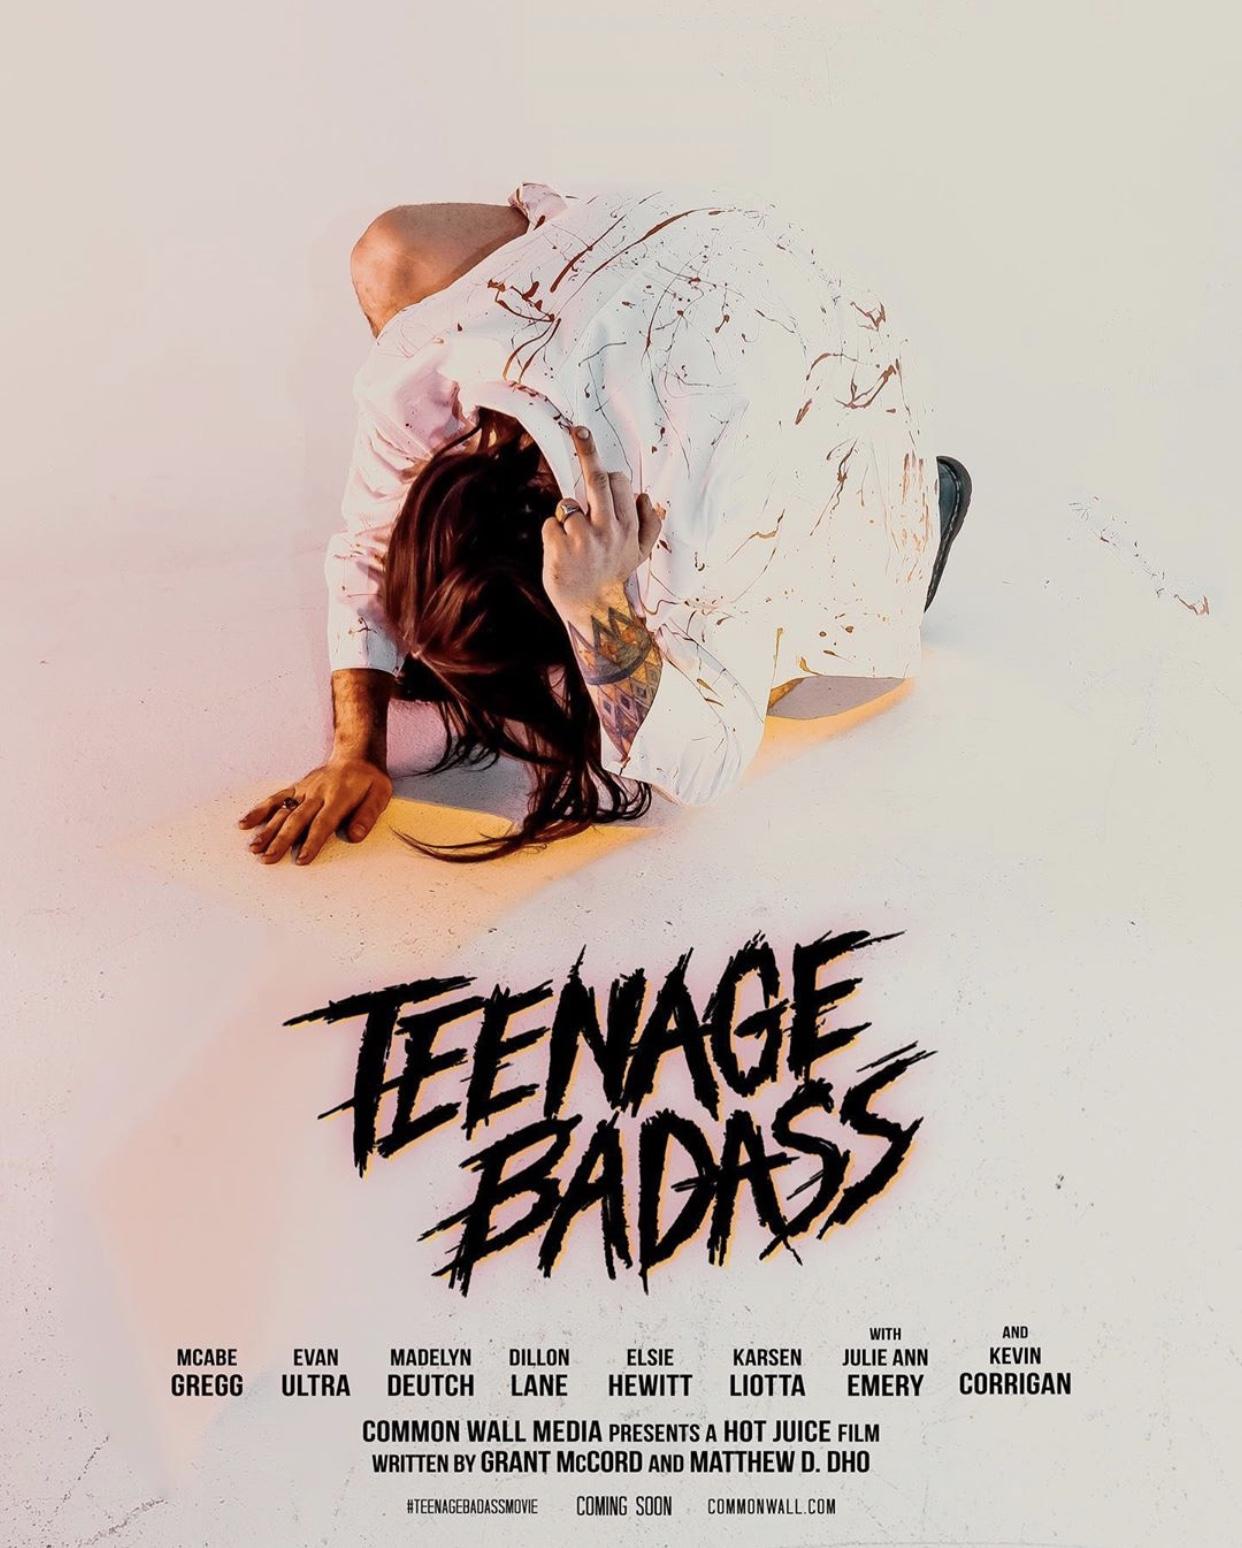 Teenage Badass hd on soap2day